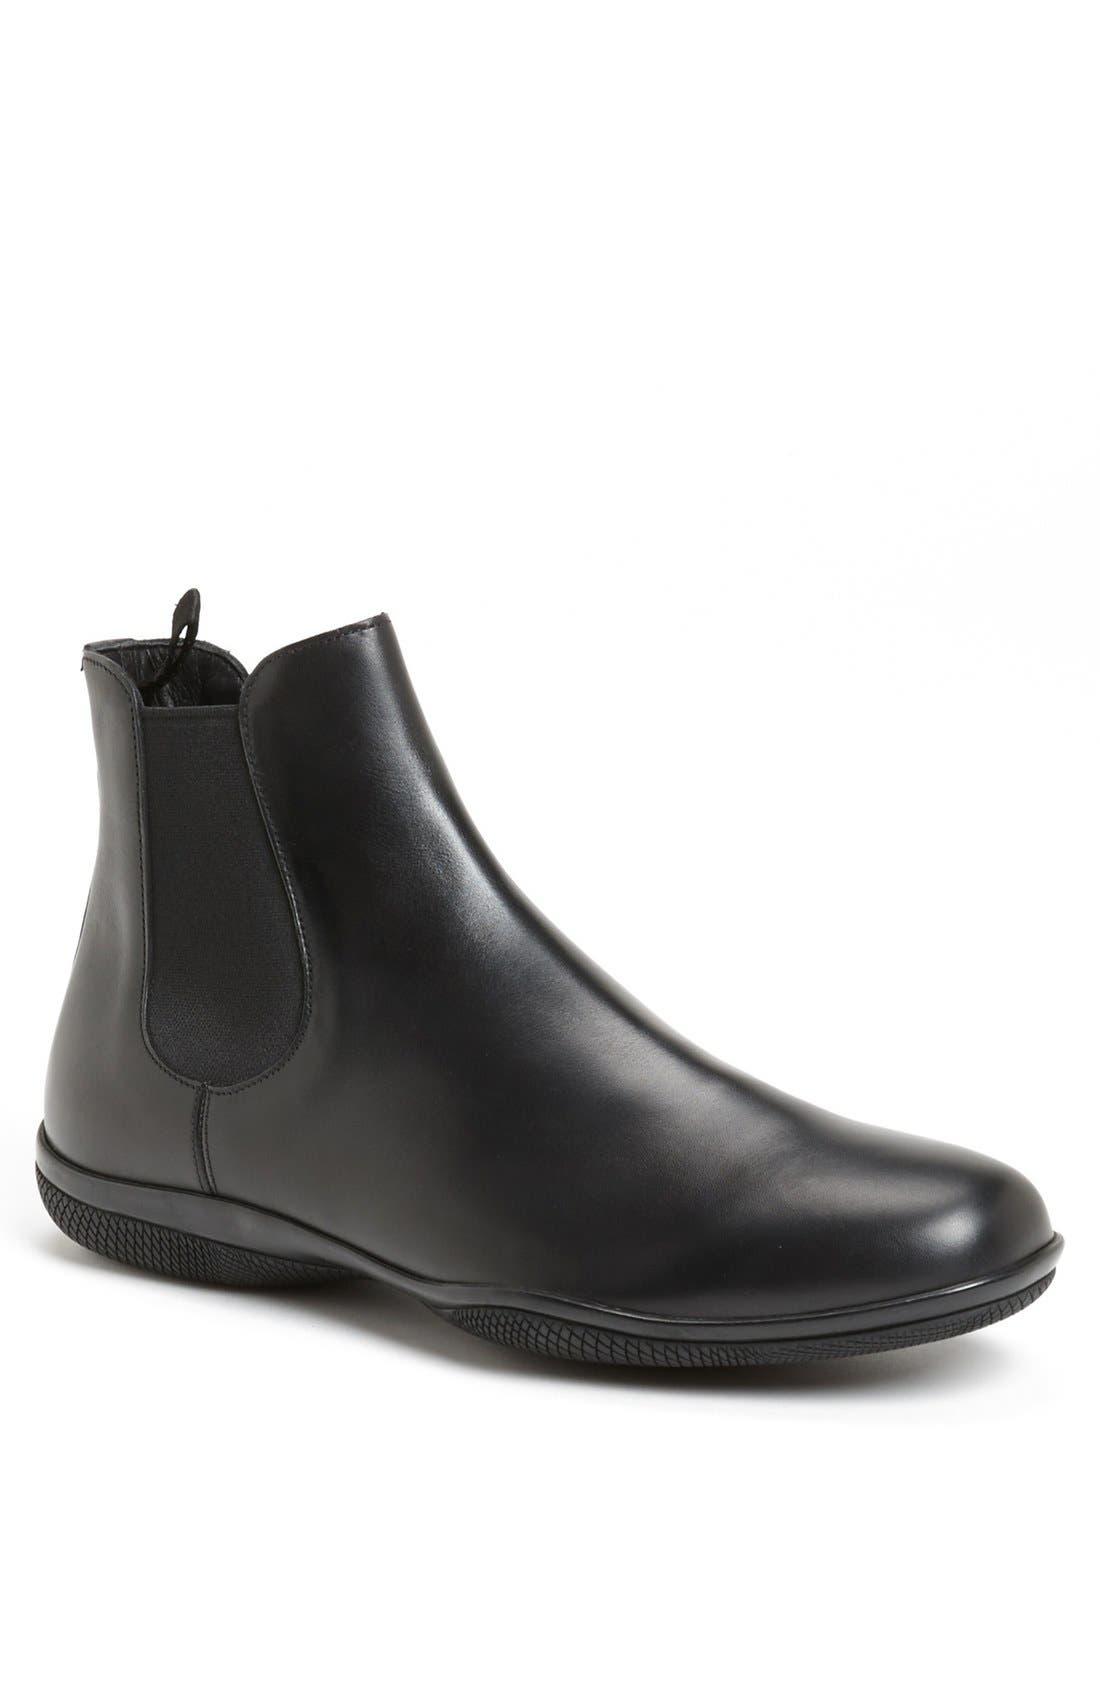 Main Image - Prada 'New Toblak' Chelsea Boot